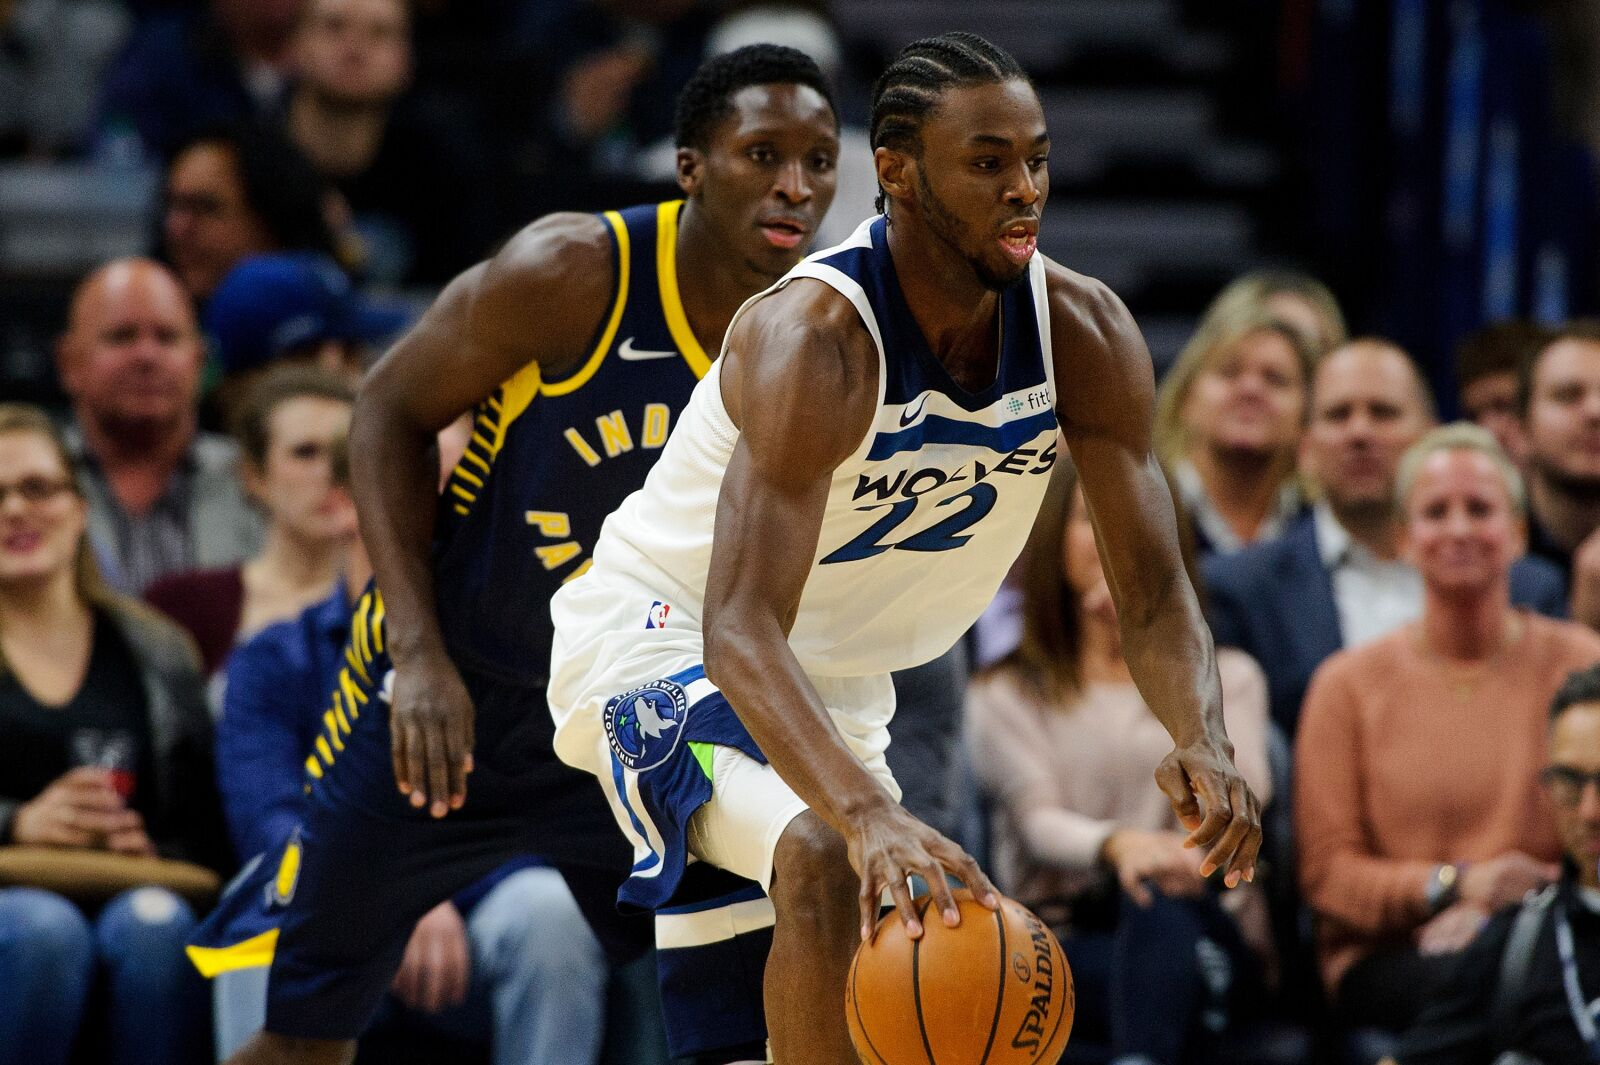 e52407b7d18 Around the NBA in 15 trades 2019  Day 9